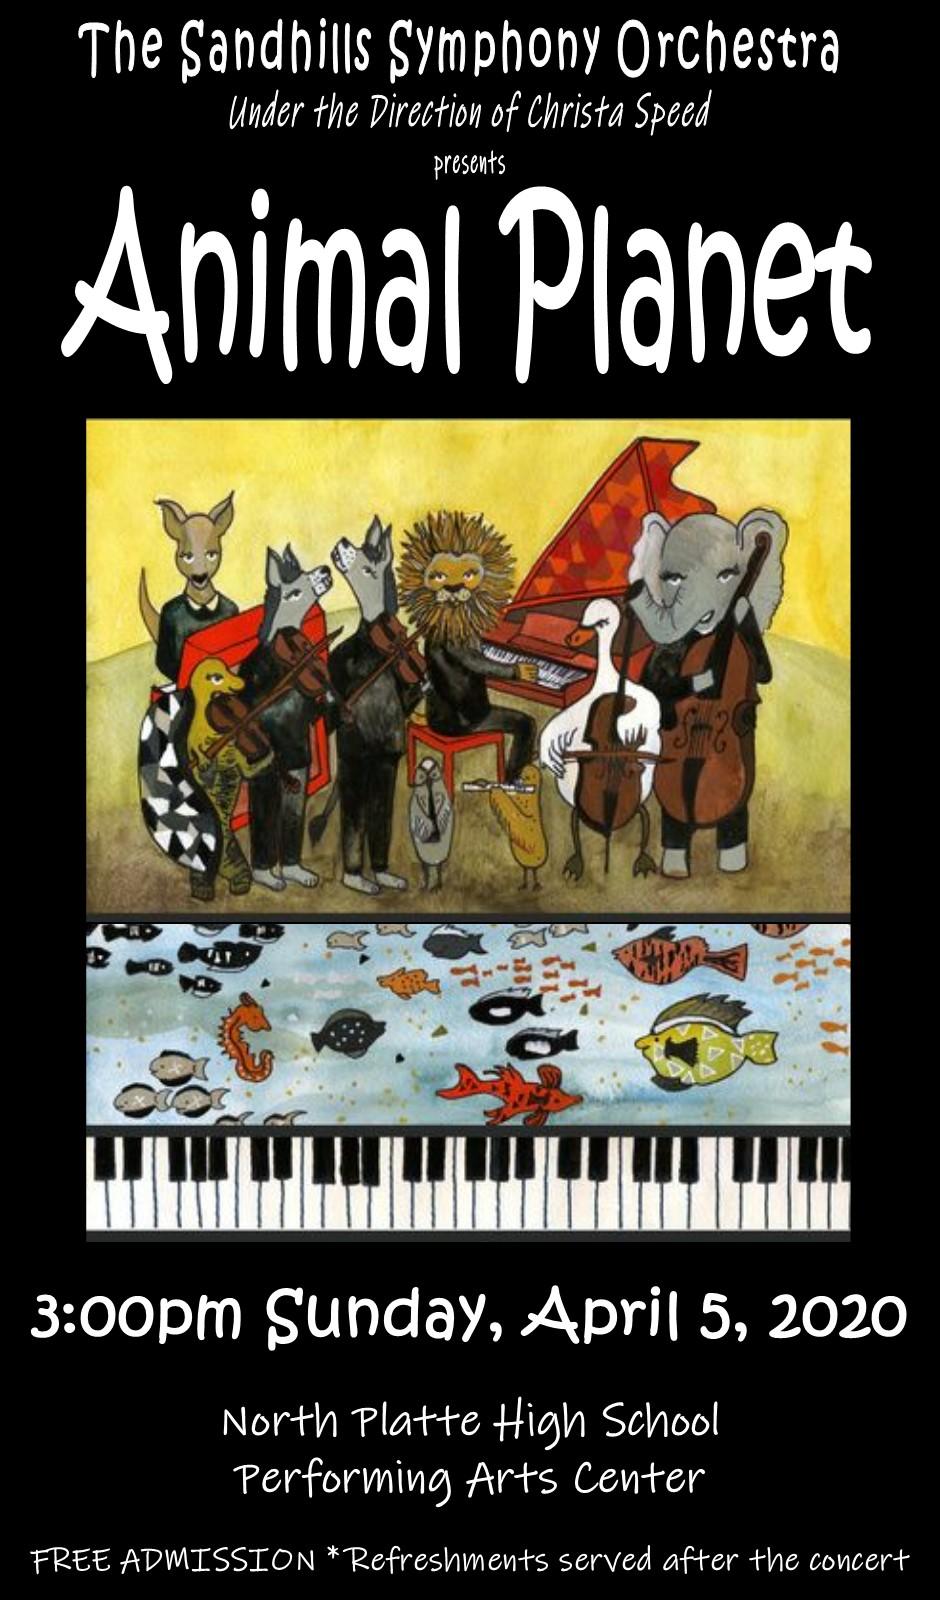 Sandhills Symphony_April 5th Concert Poster (1)